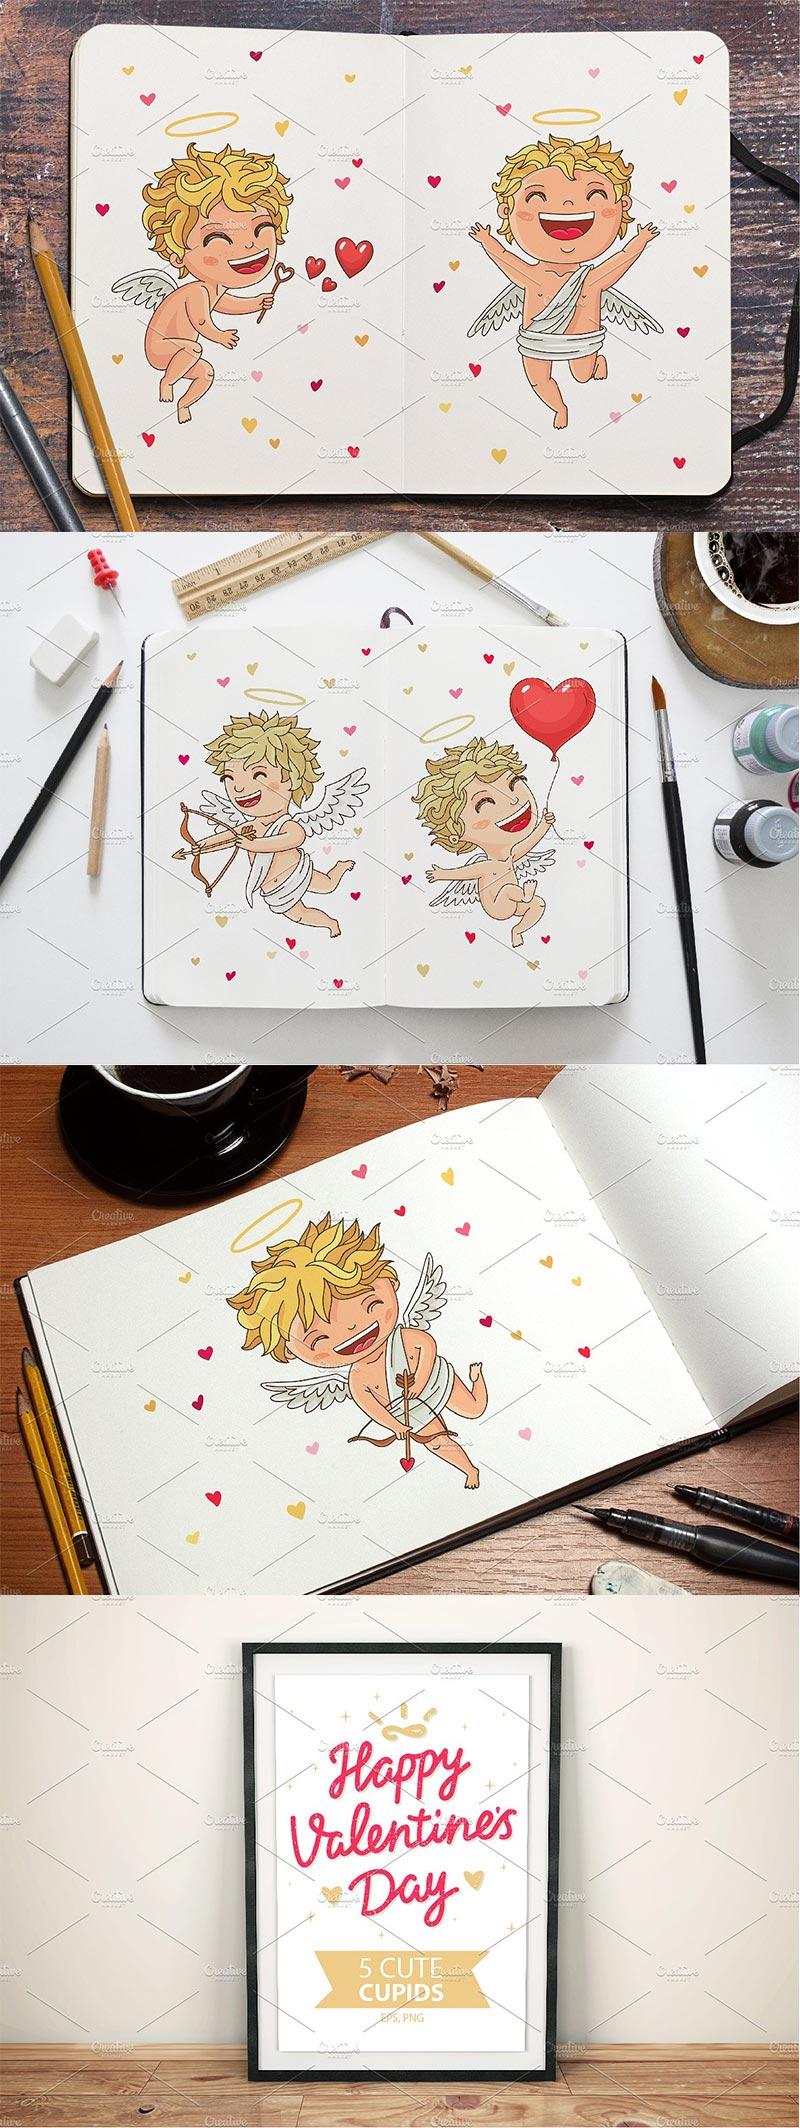 Happy Valentine's Day – 5 Cupids